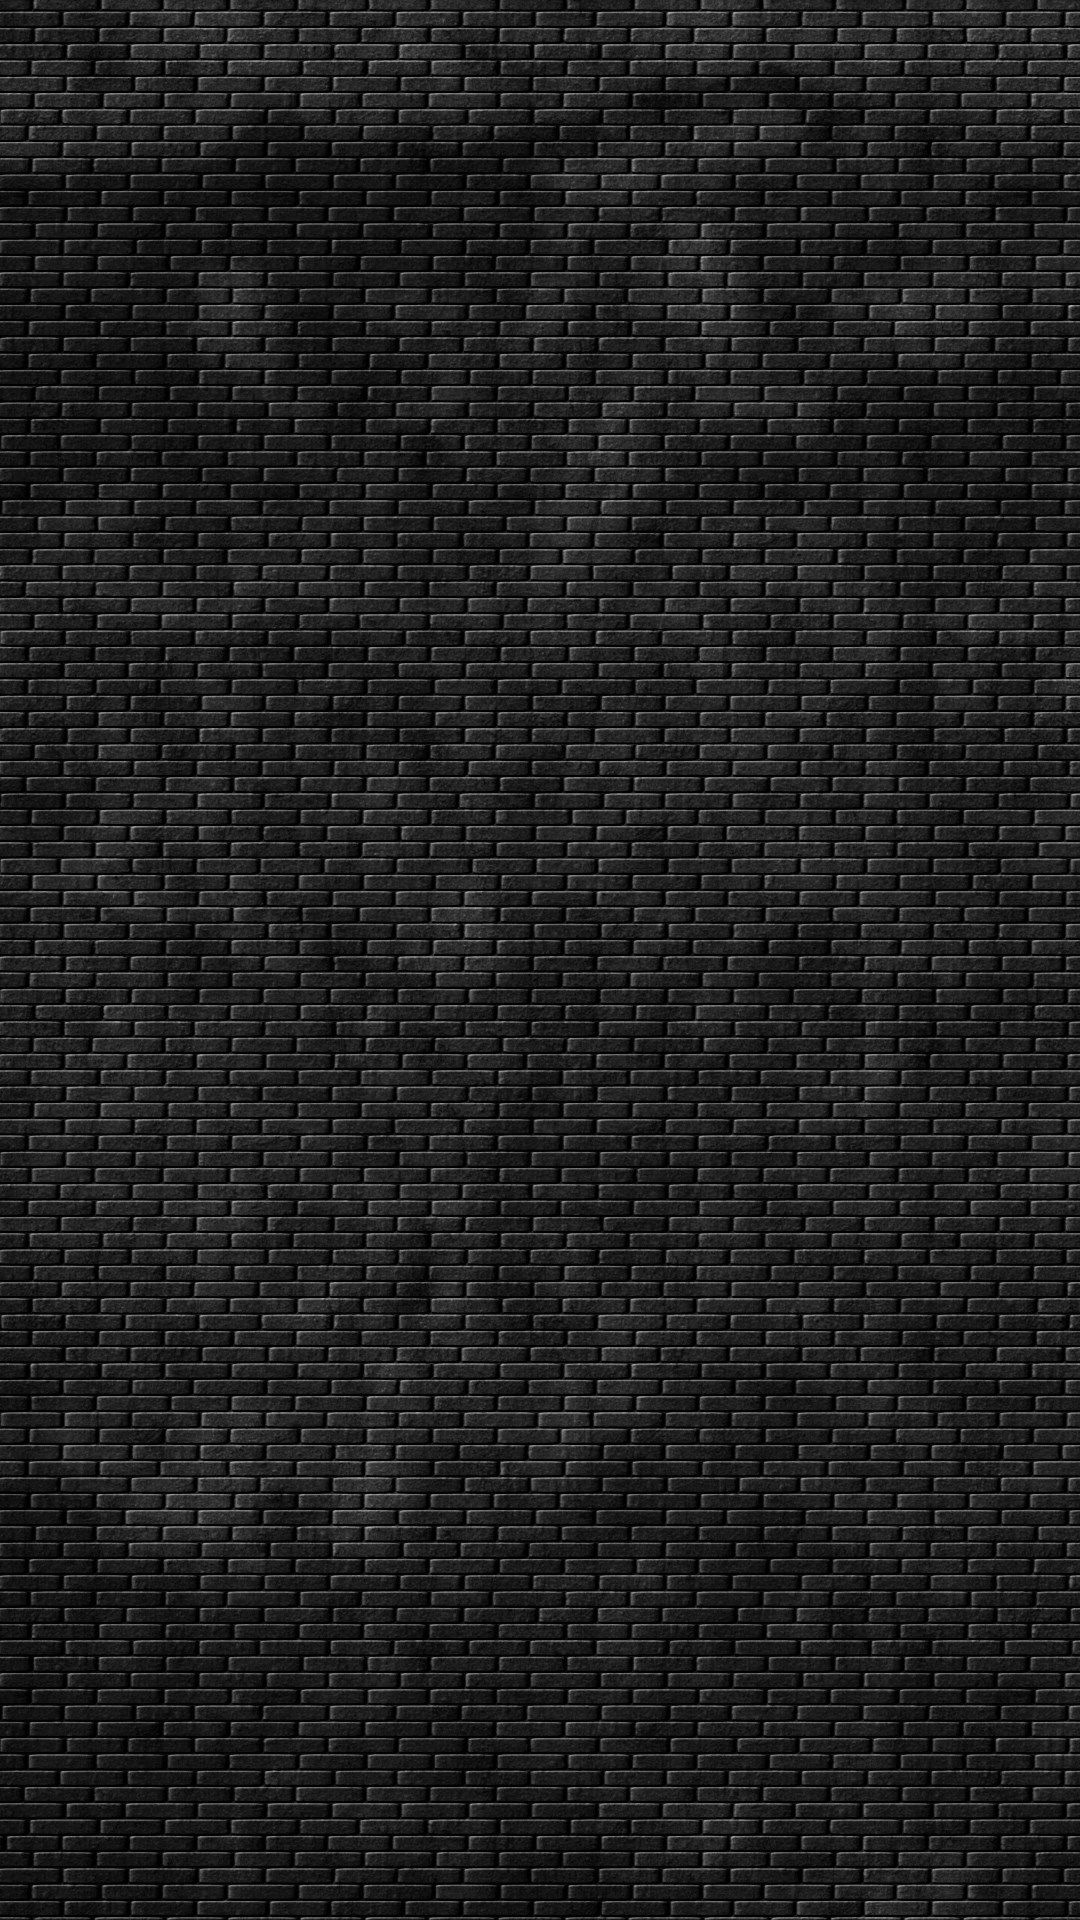 Black Brick Wallpaper Android > Flip Wallpapers > Download ...